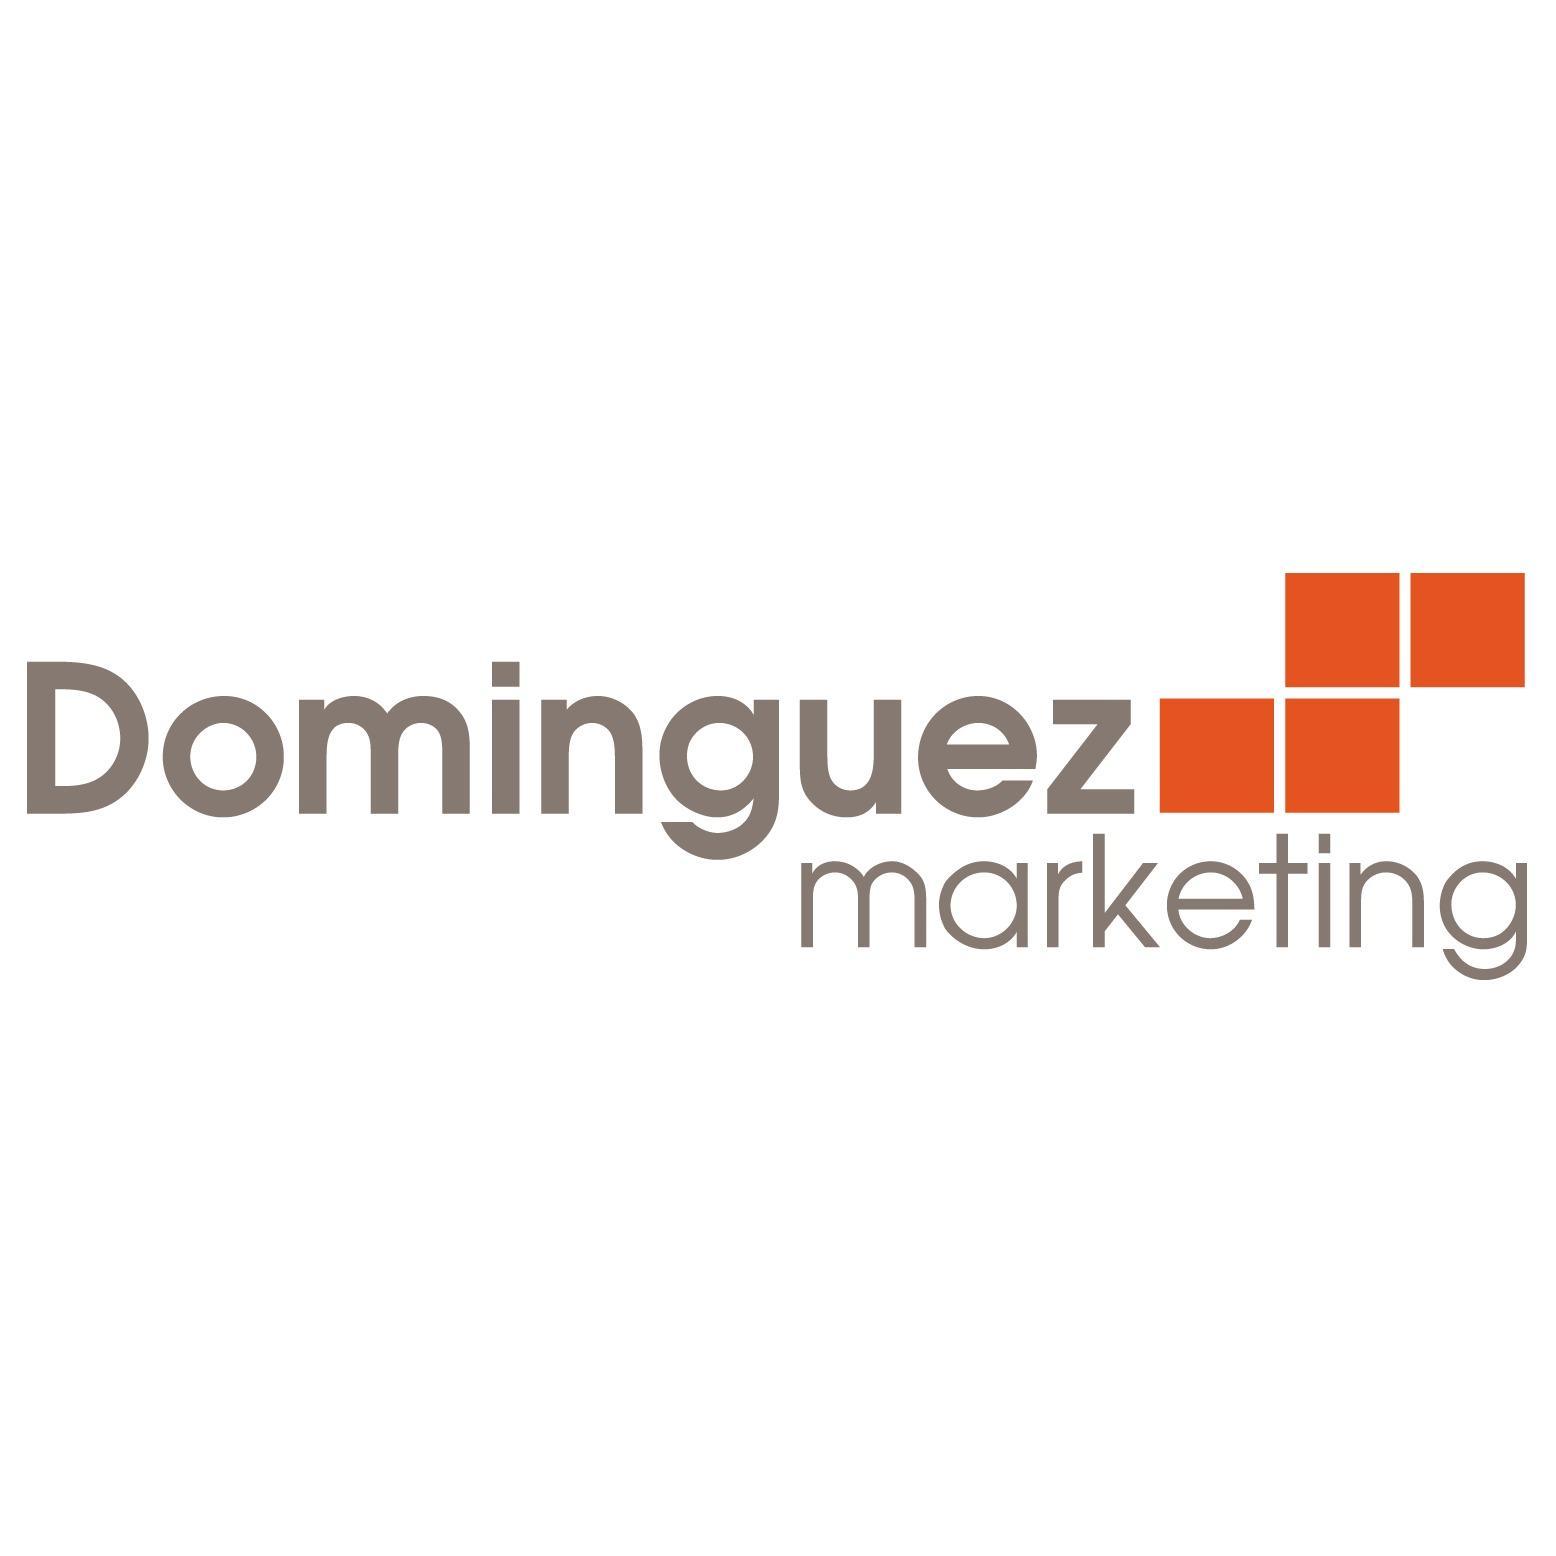 Dominguez Marketing - Digital Marketing & Website Design Company